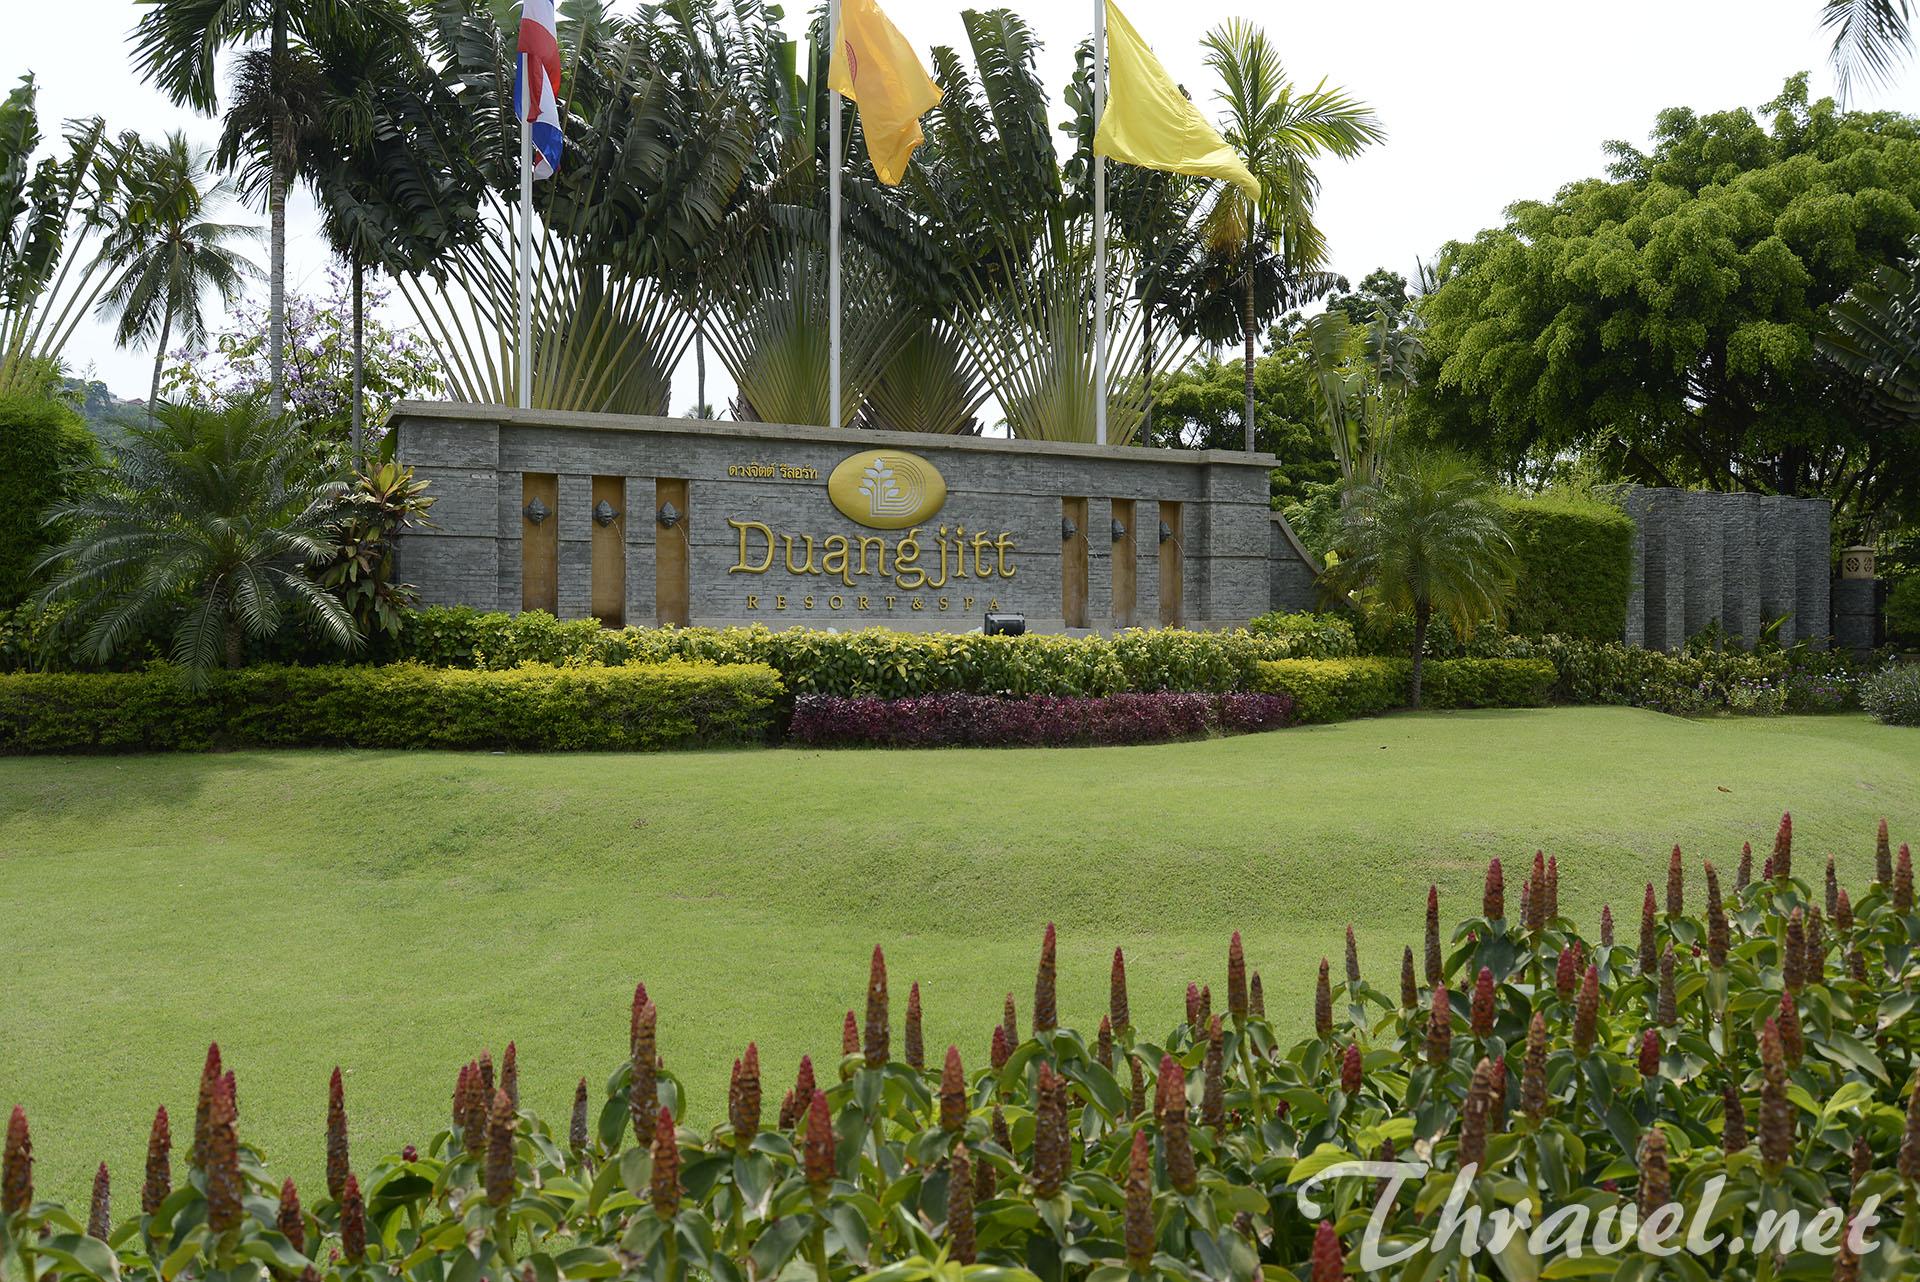 duangjitt-resort-and-spa-hotel-patong-beach-phuket-thailand-03